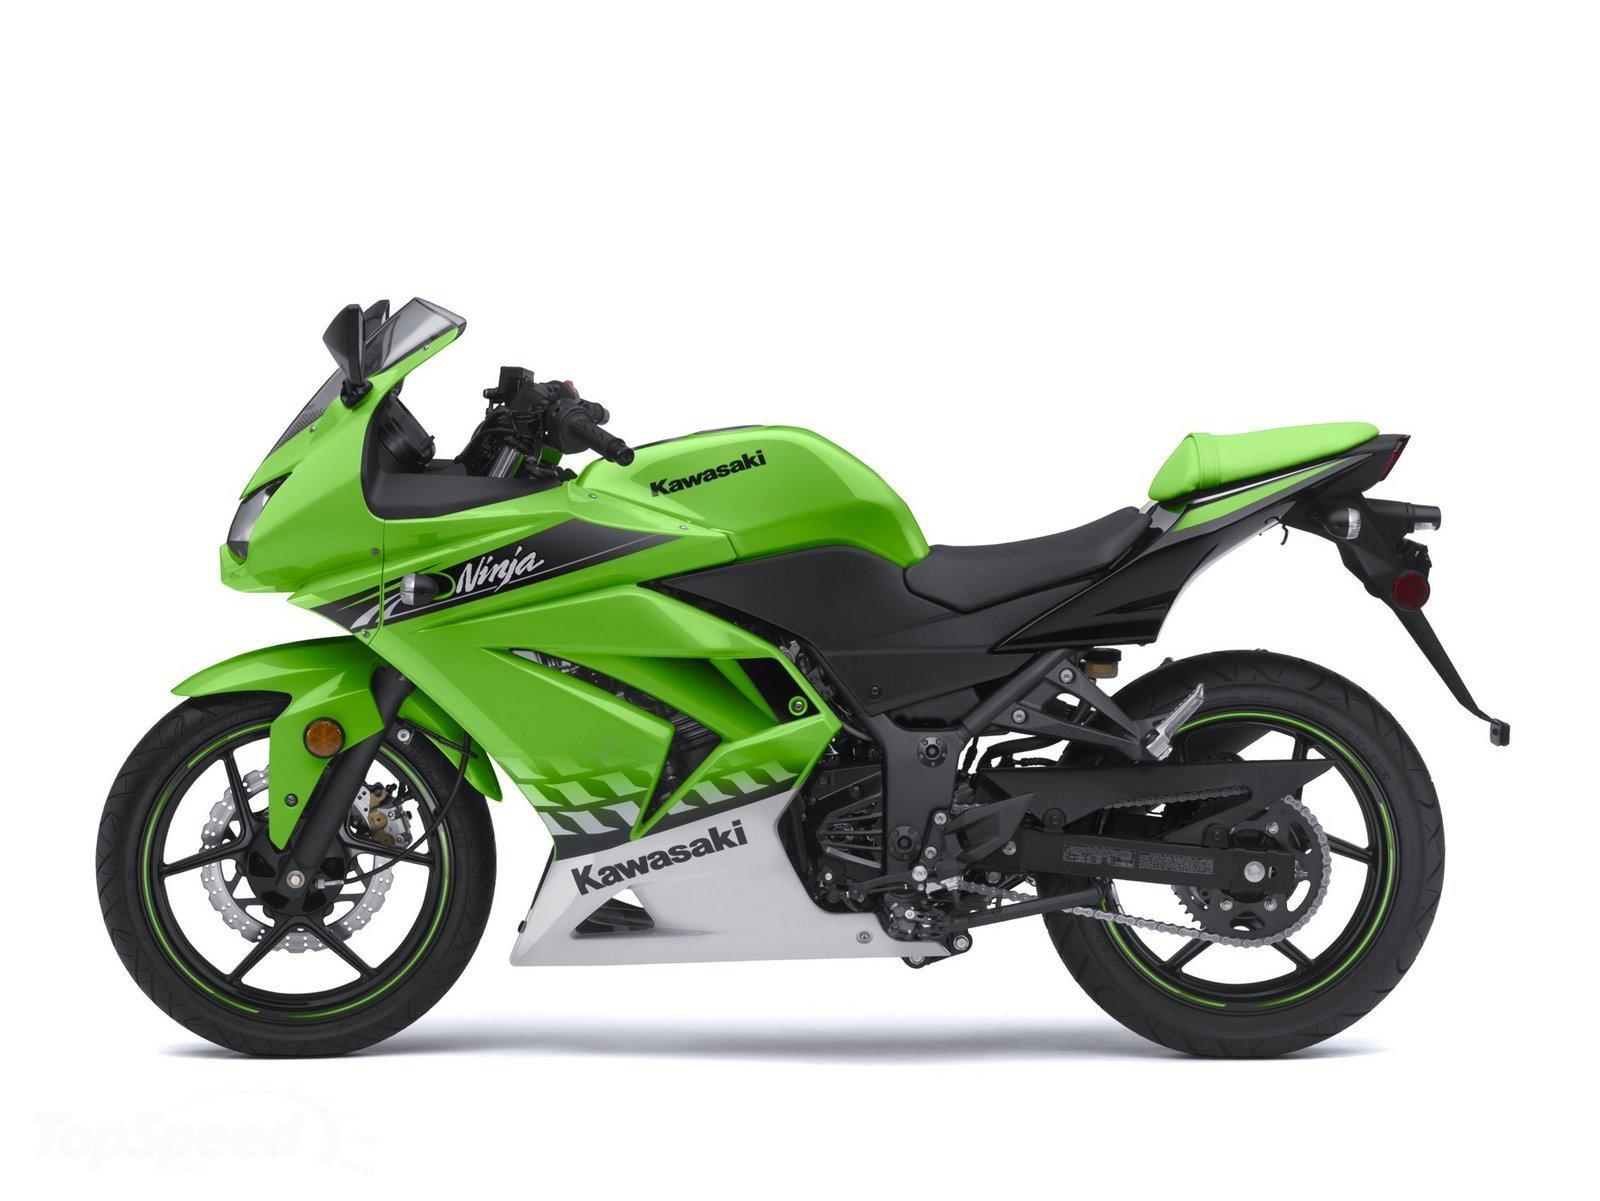 Suzuki gsx r1000 Blogs      2010 Kawasaki Ninja 250R